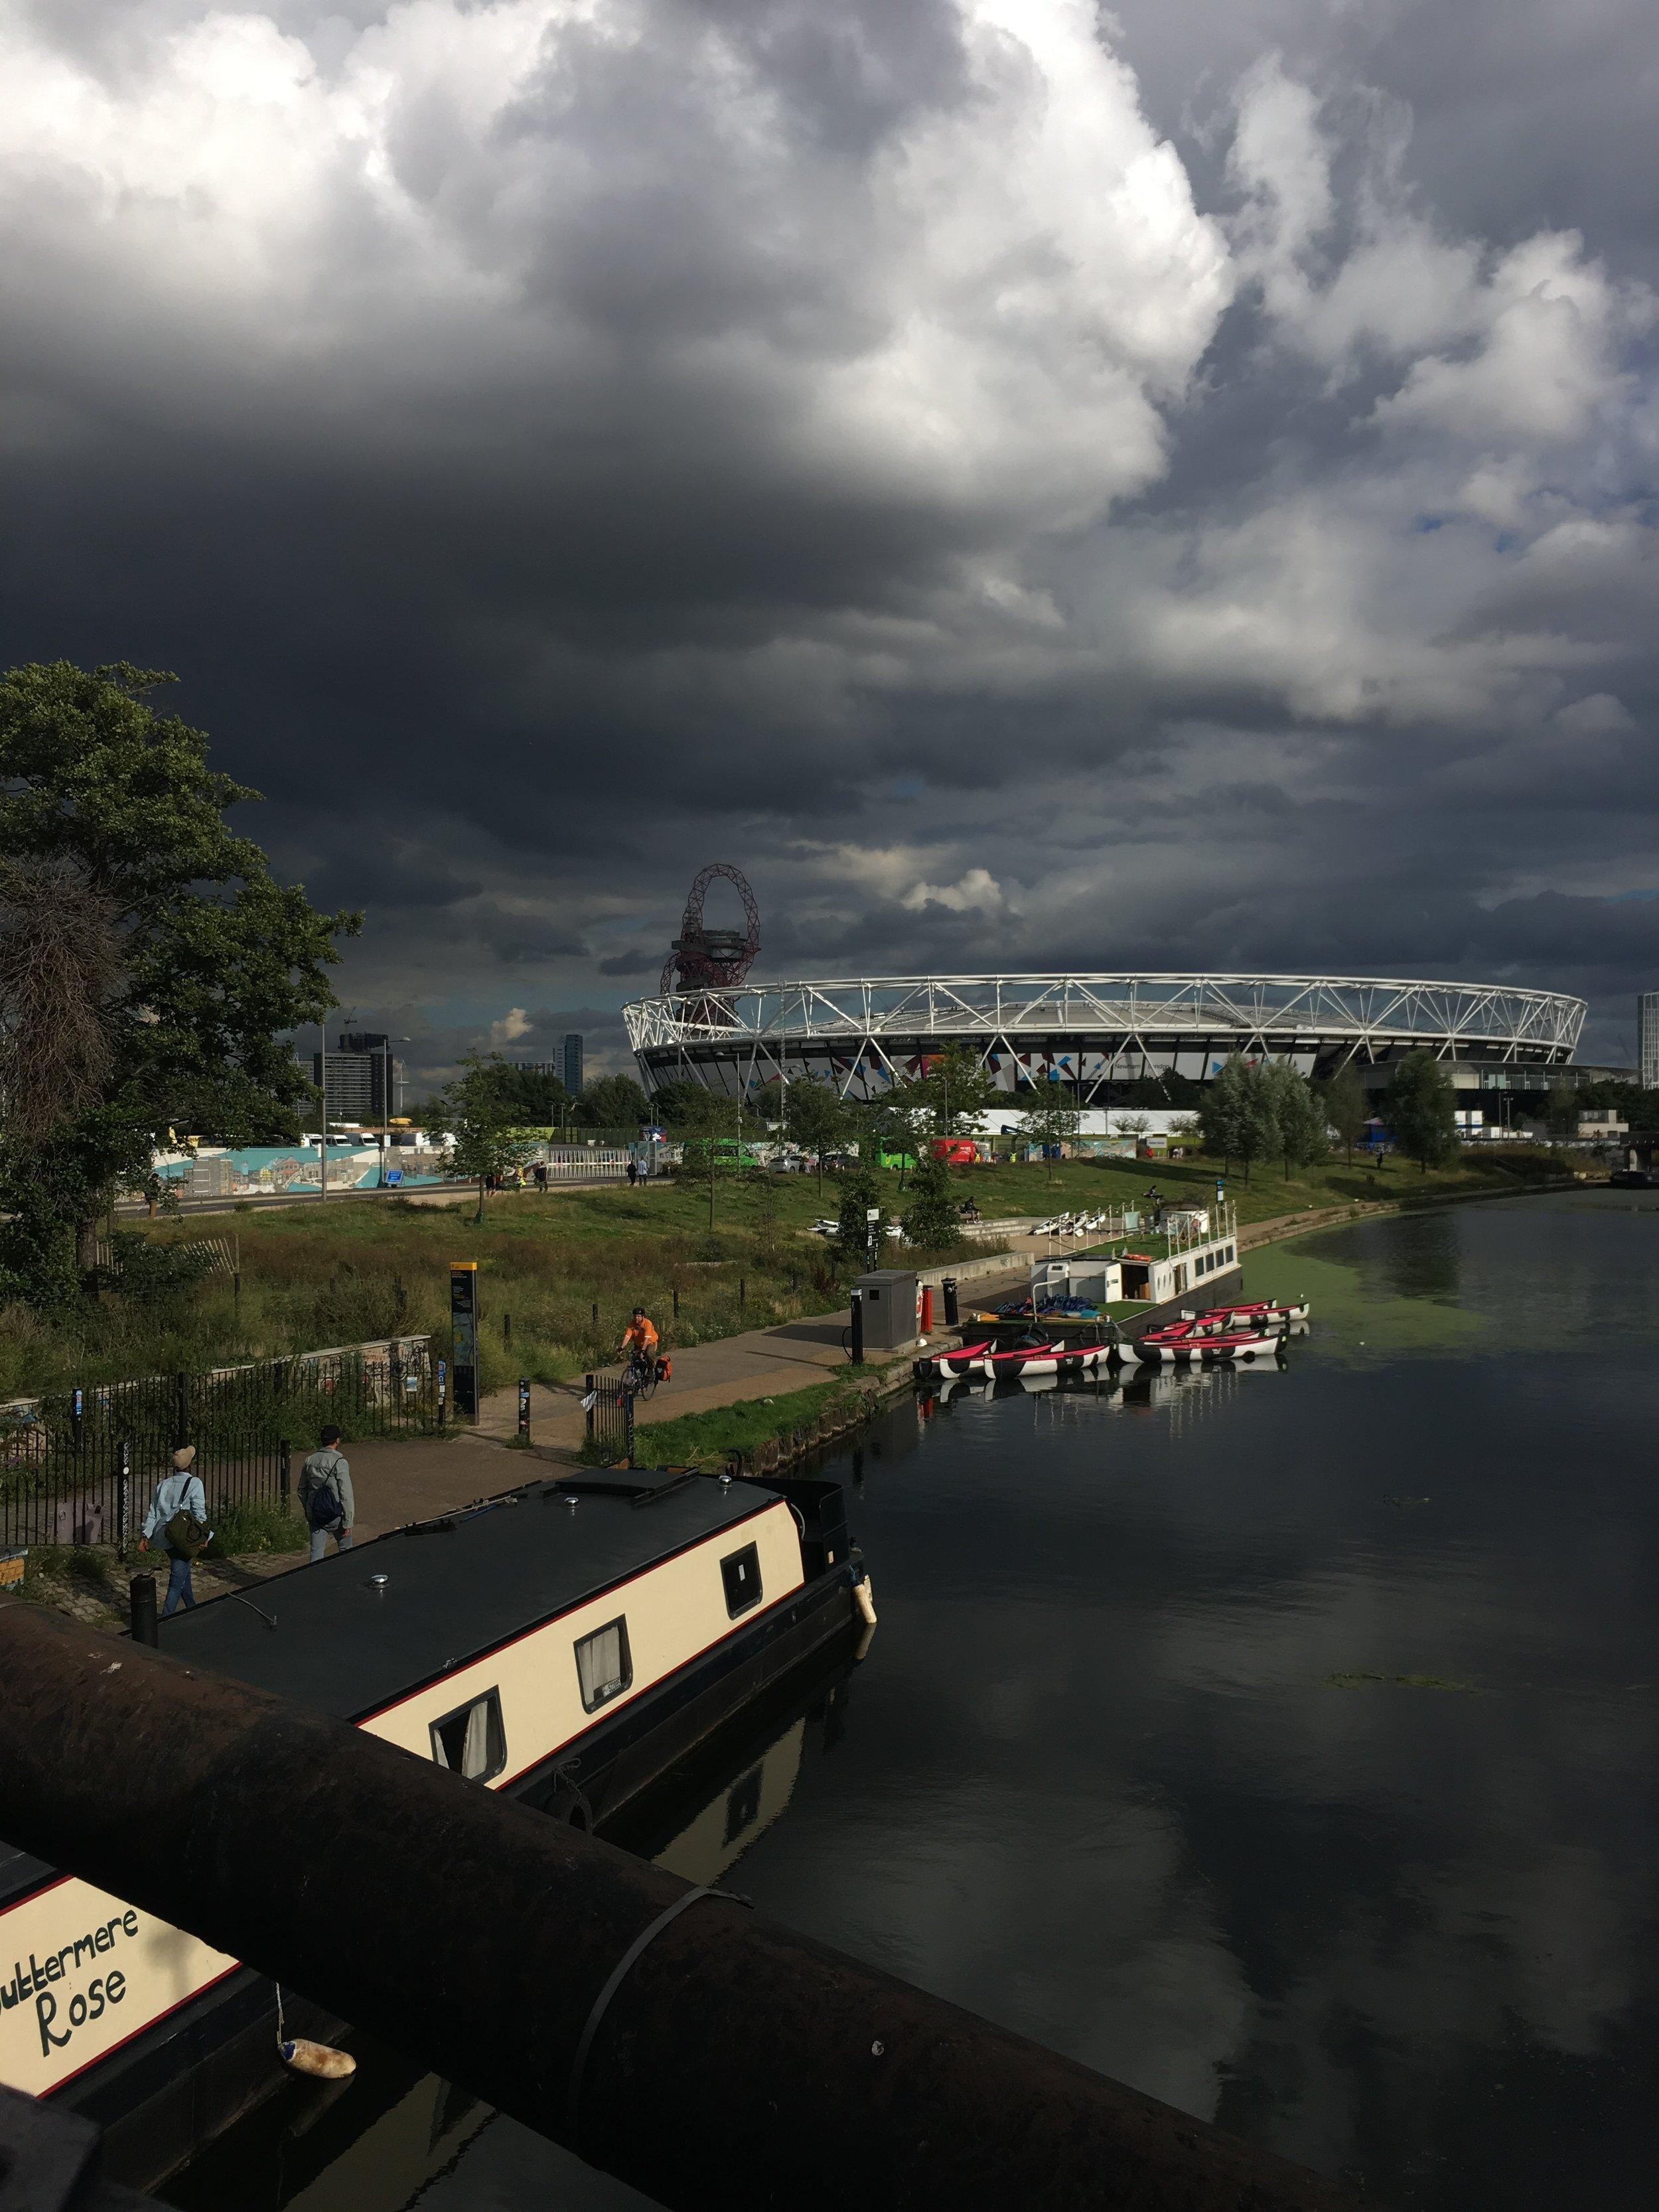 Moody sky over London Stadium but it didn't rain